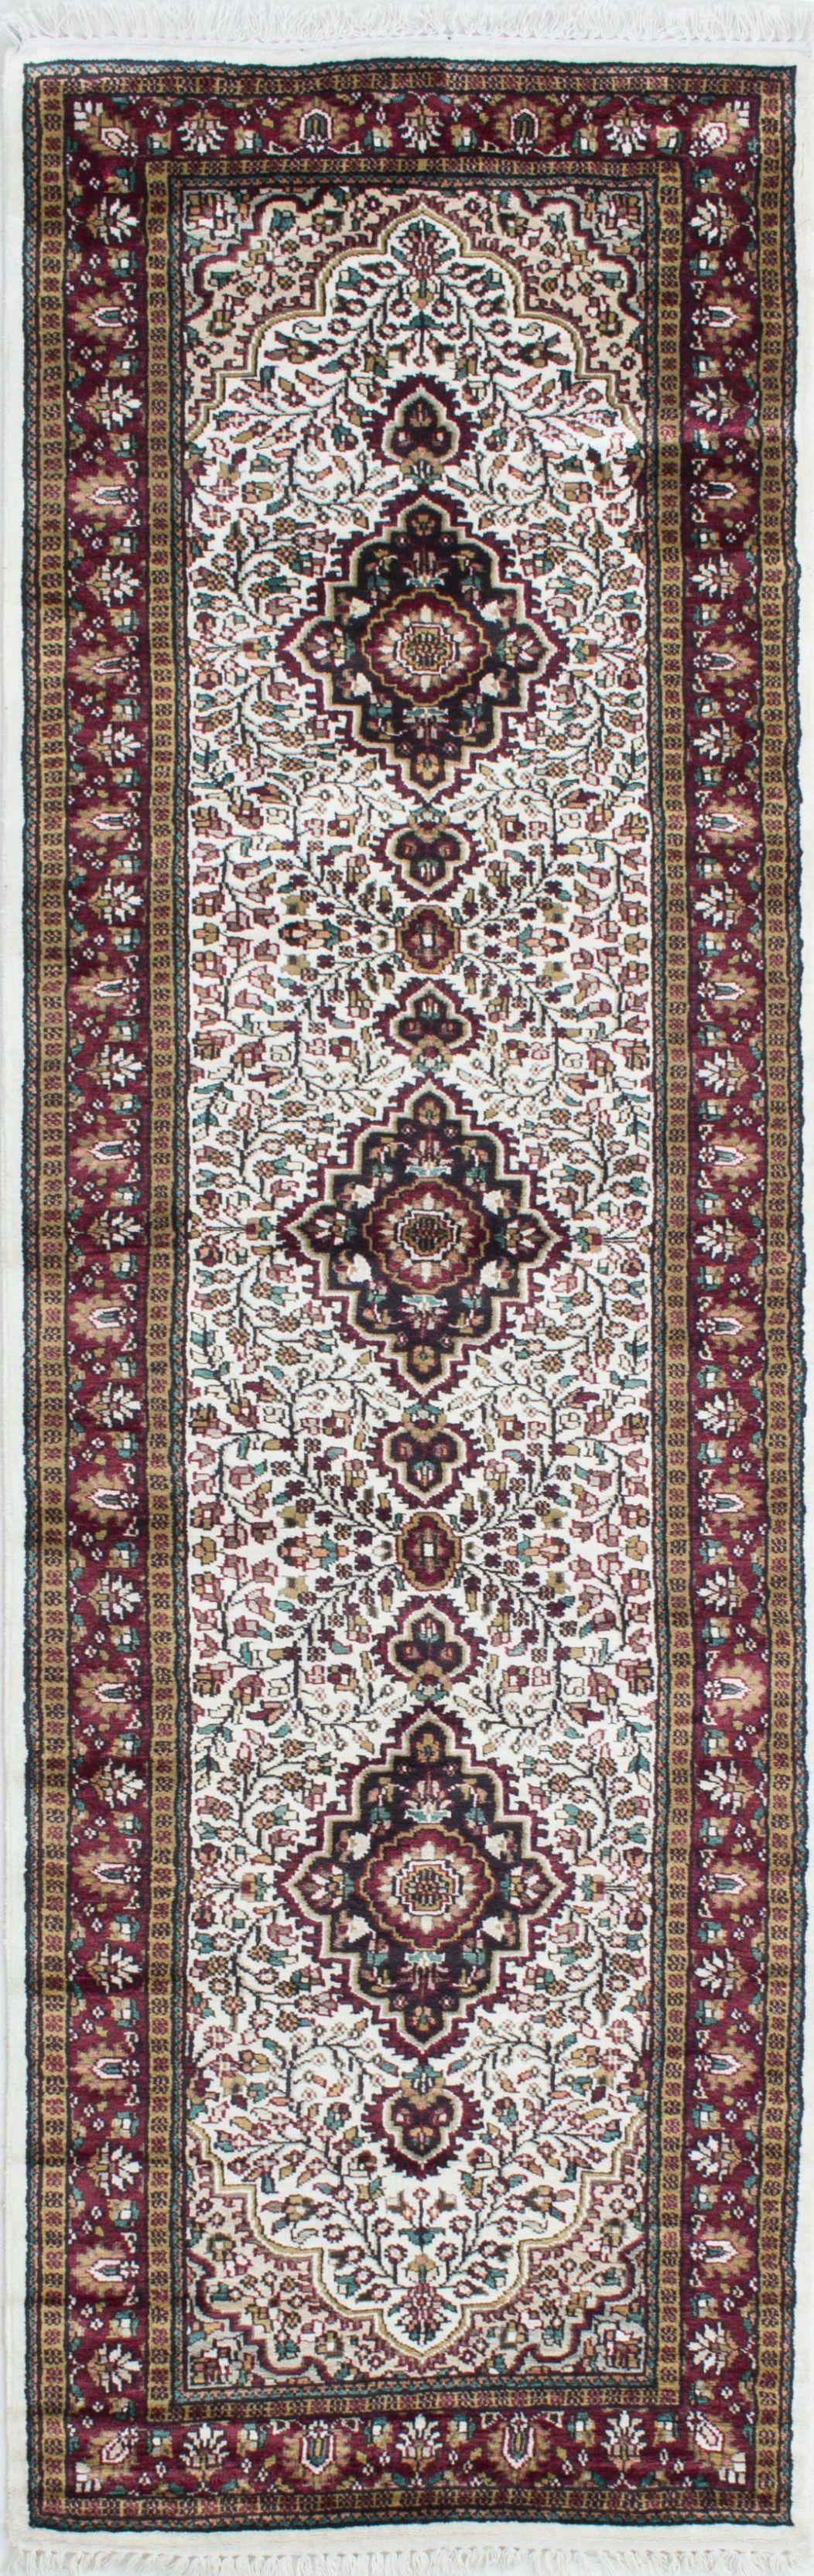 "Hand-knotted Kashmir Cream Silk Rug 2'8"" x 8'6"" Size: 2'8"" x 8'6"""